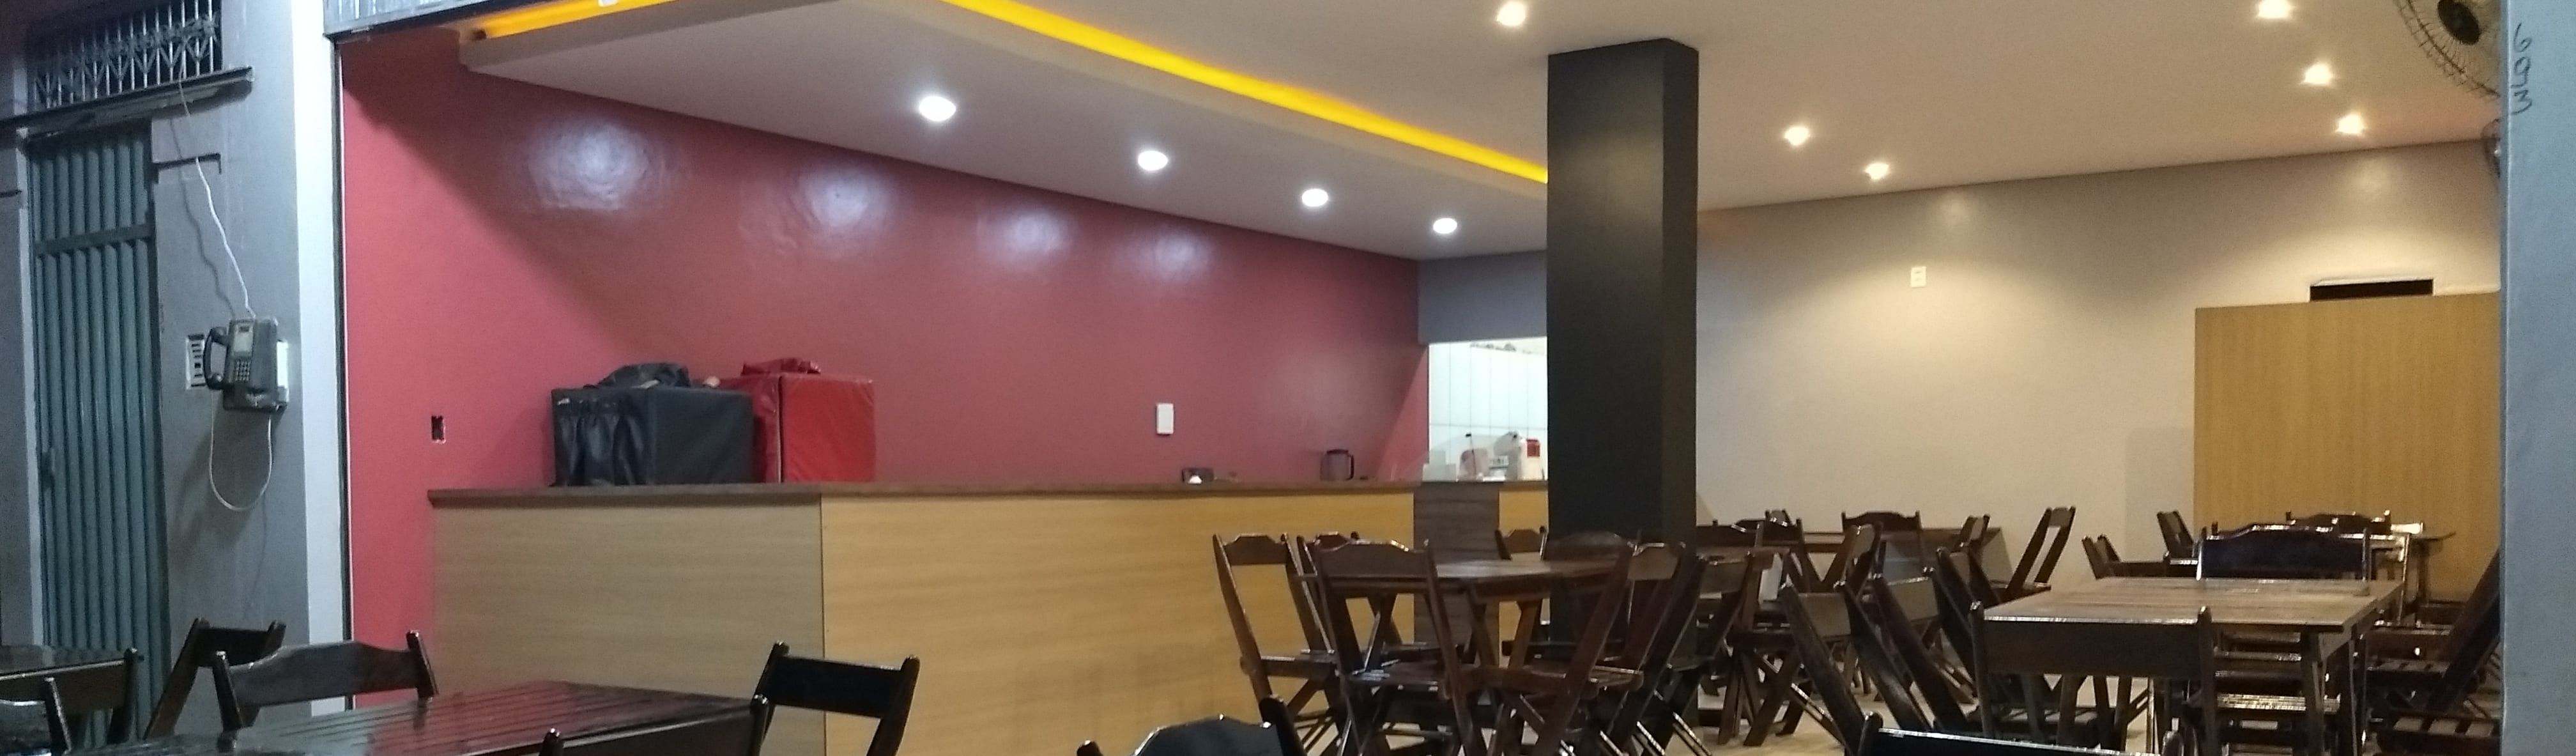 Ativo Arquitetura e Consultoria